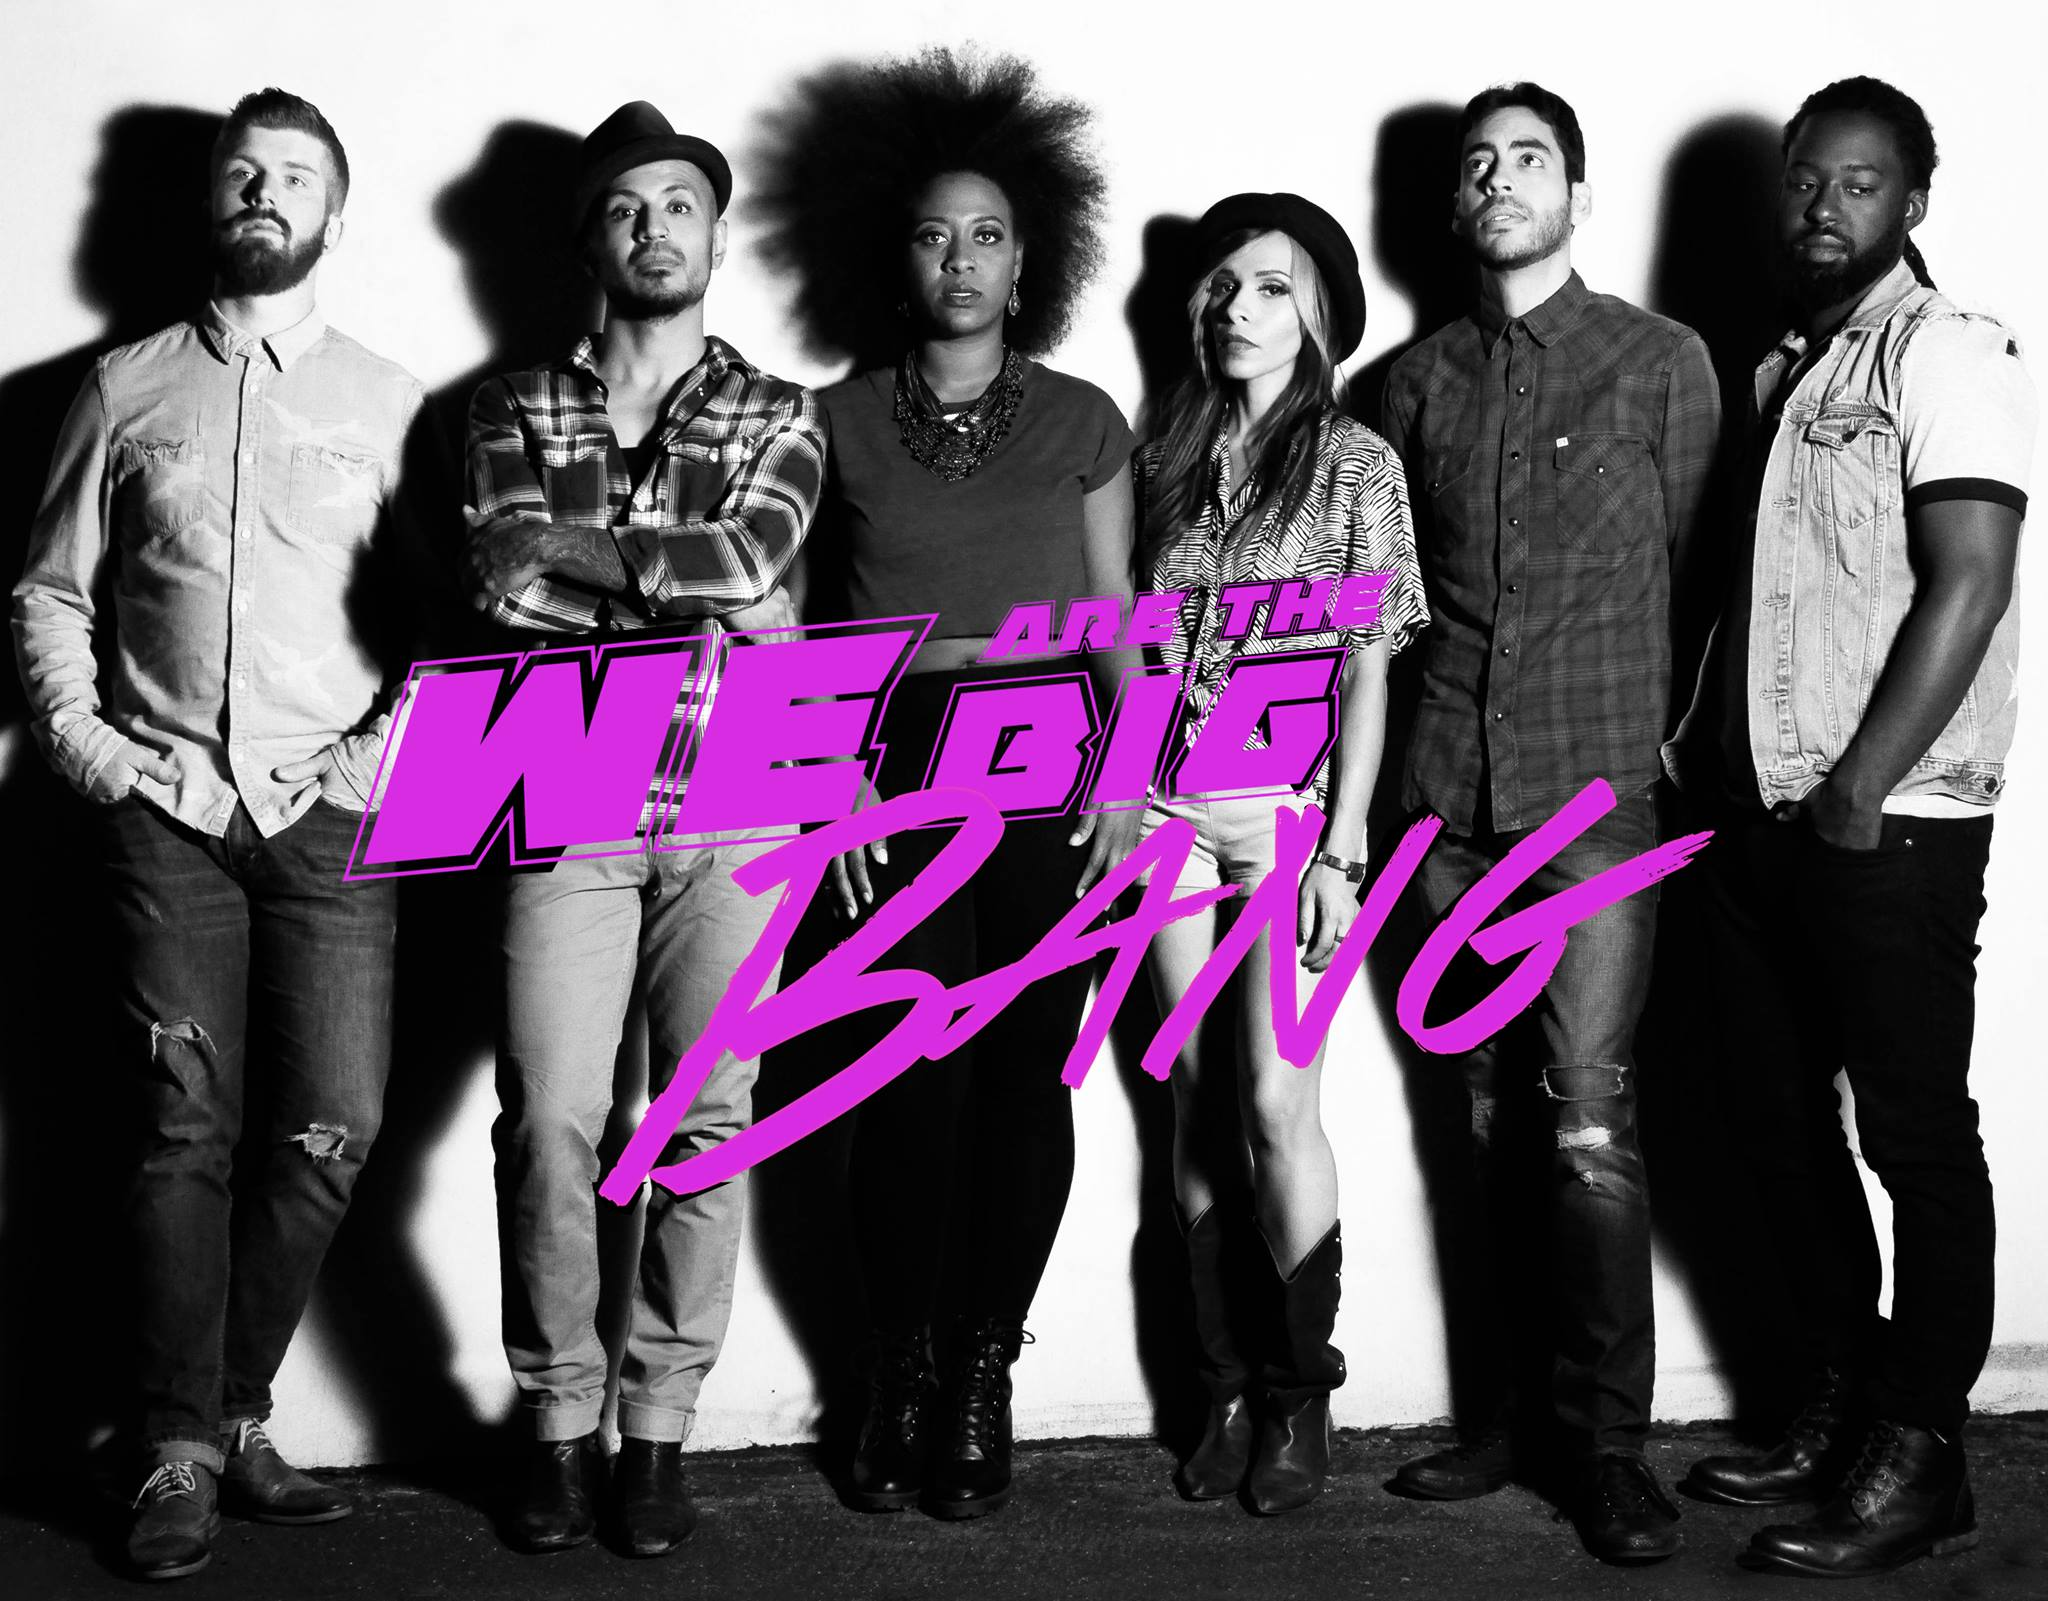 weareTheBigBang's New Video Premieres on Indie Minded